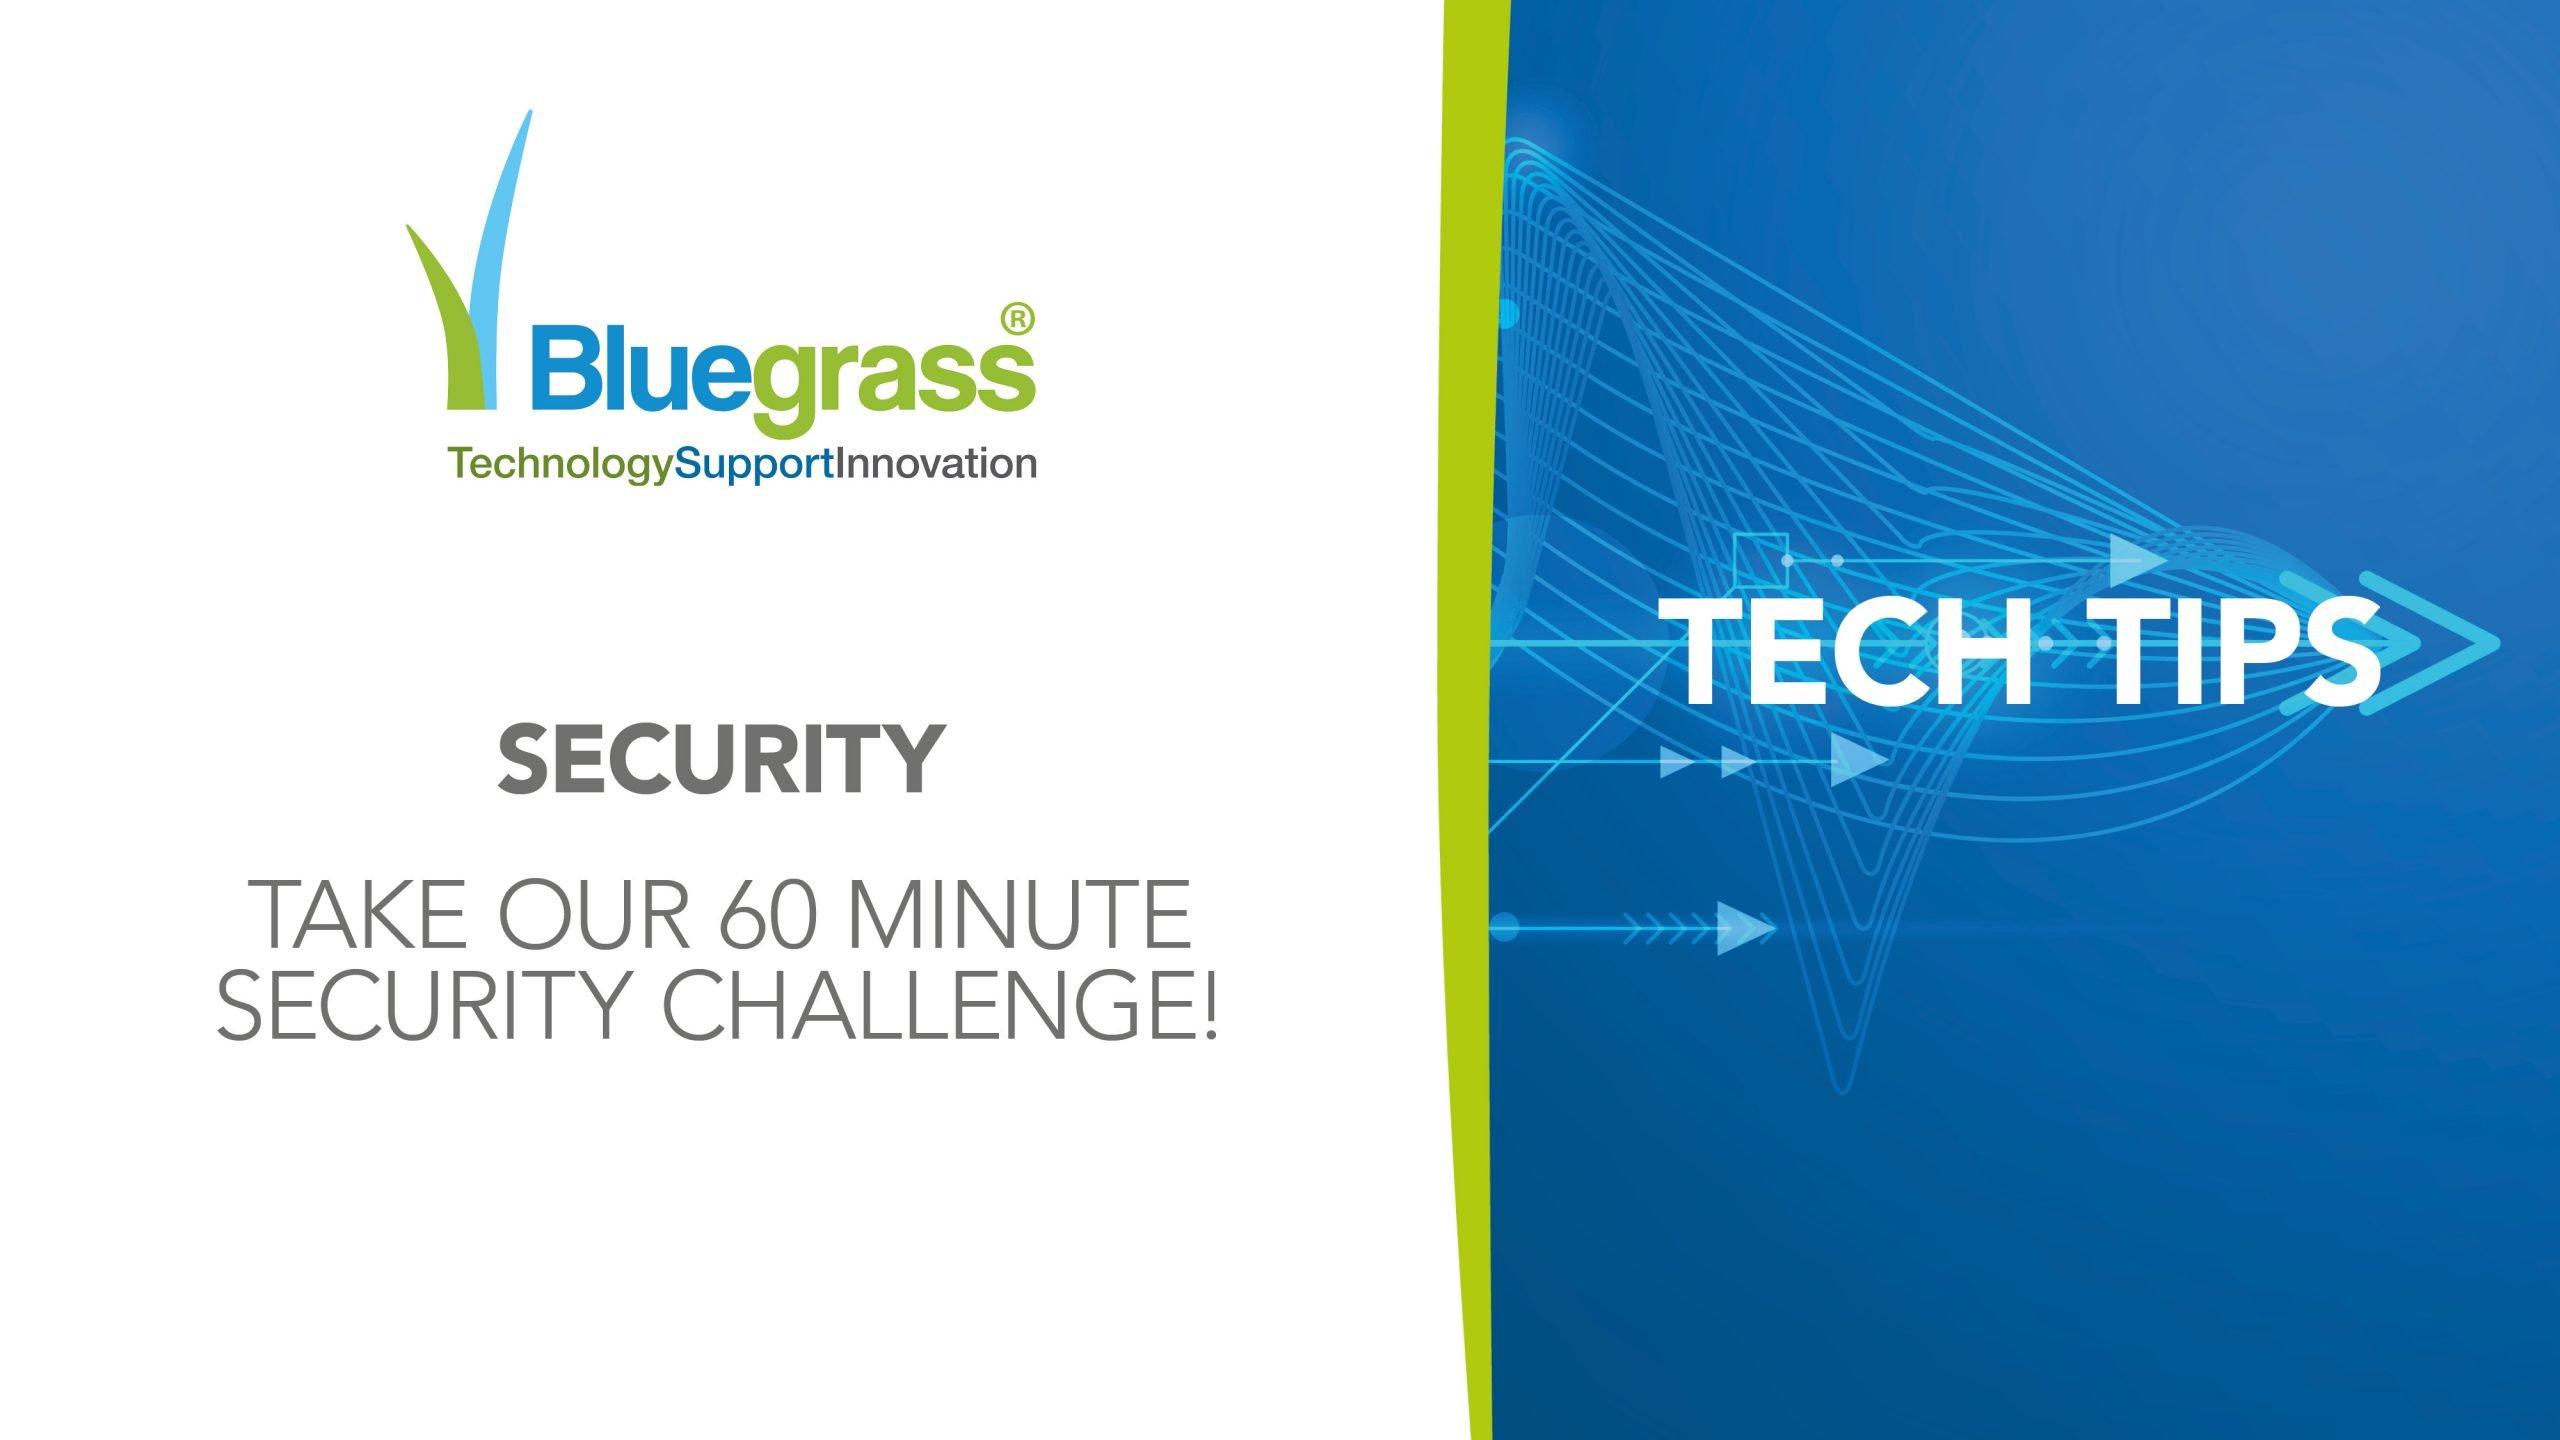 Tech tips 60 mins challenge